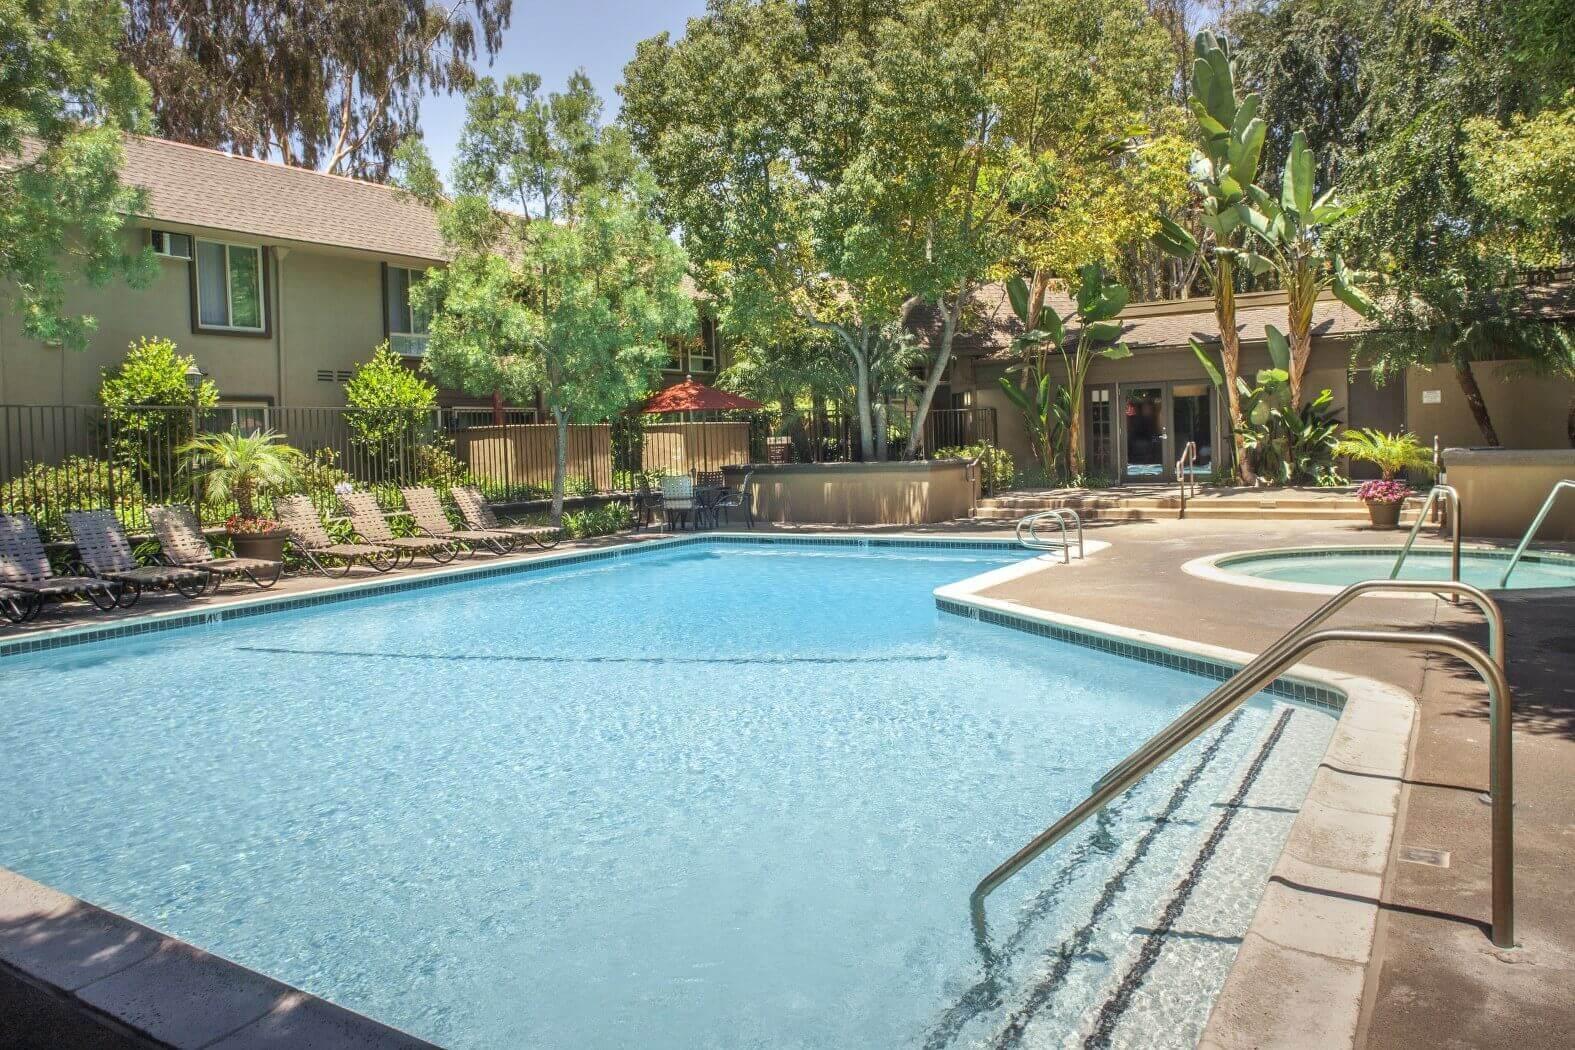 Cool Blue Swimming Pool at Hills at Hacienda Heights, Hacienda Heights, CA, 91745